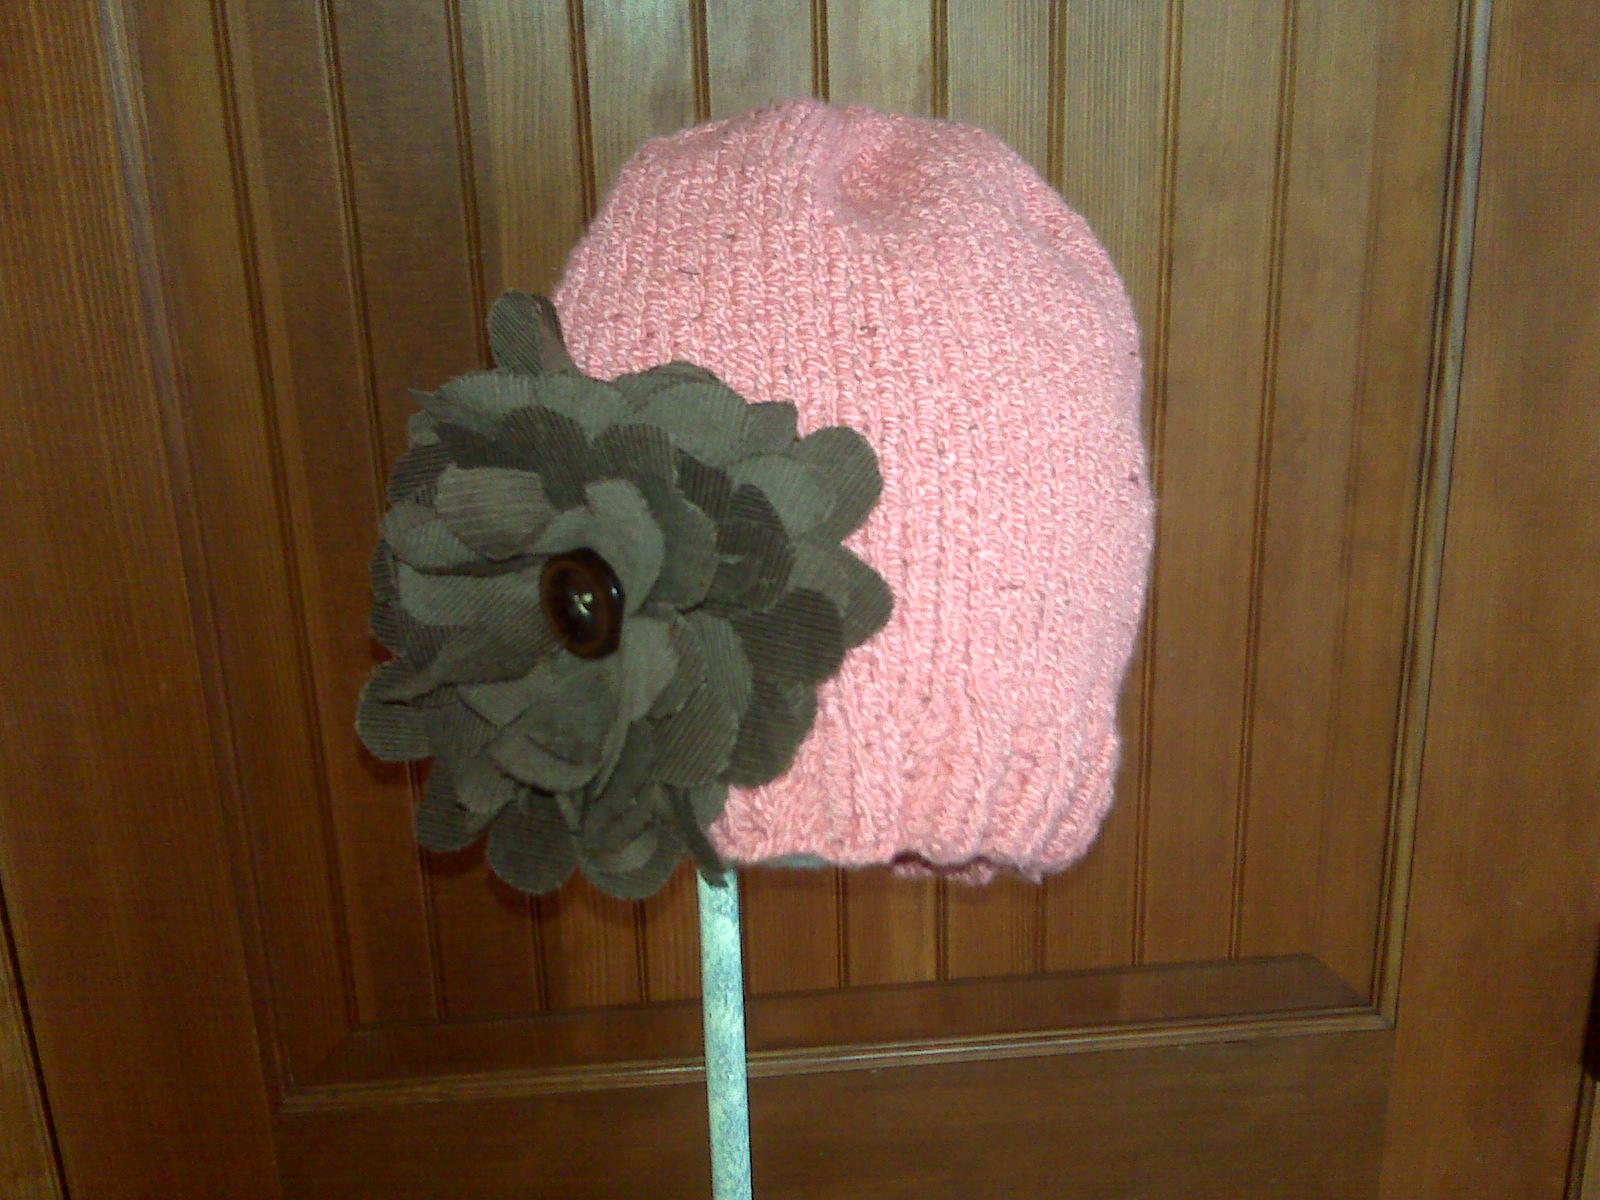 [Quinn's+hat.aspx]